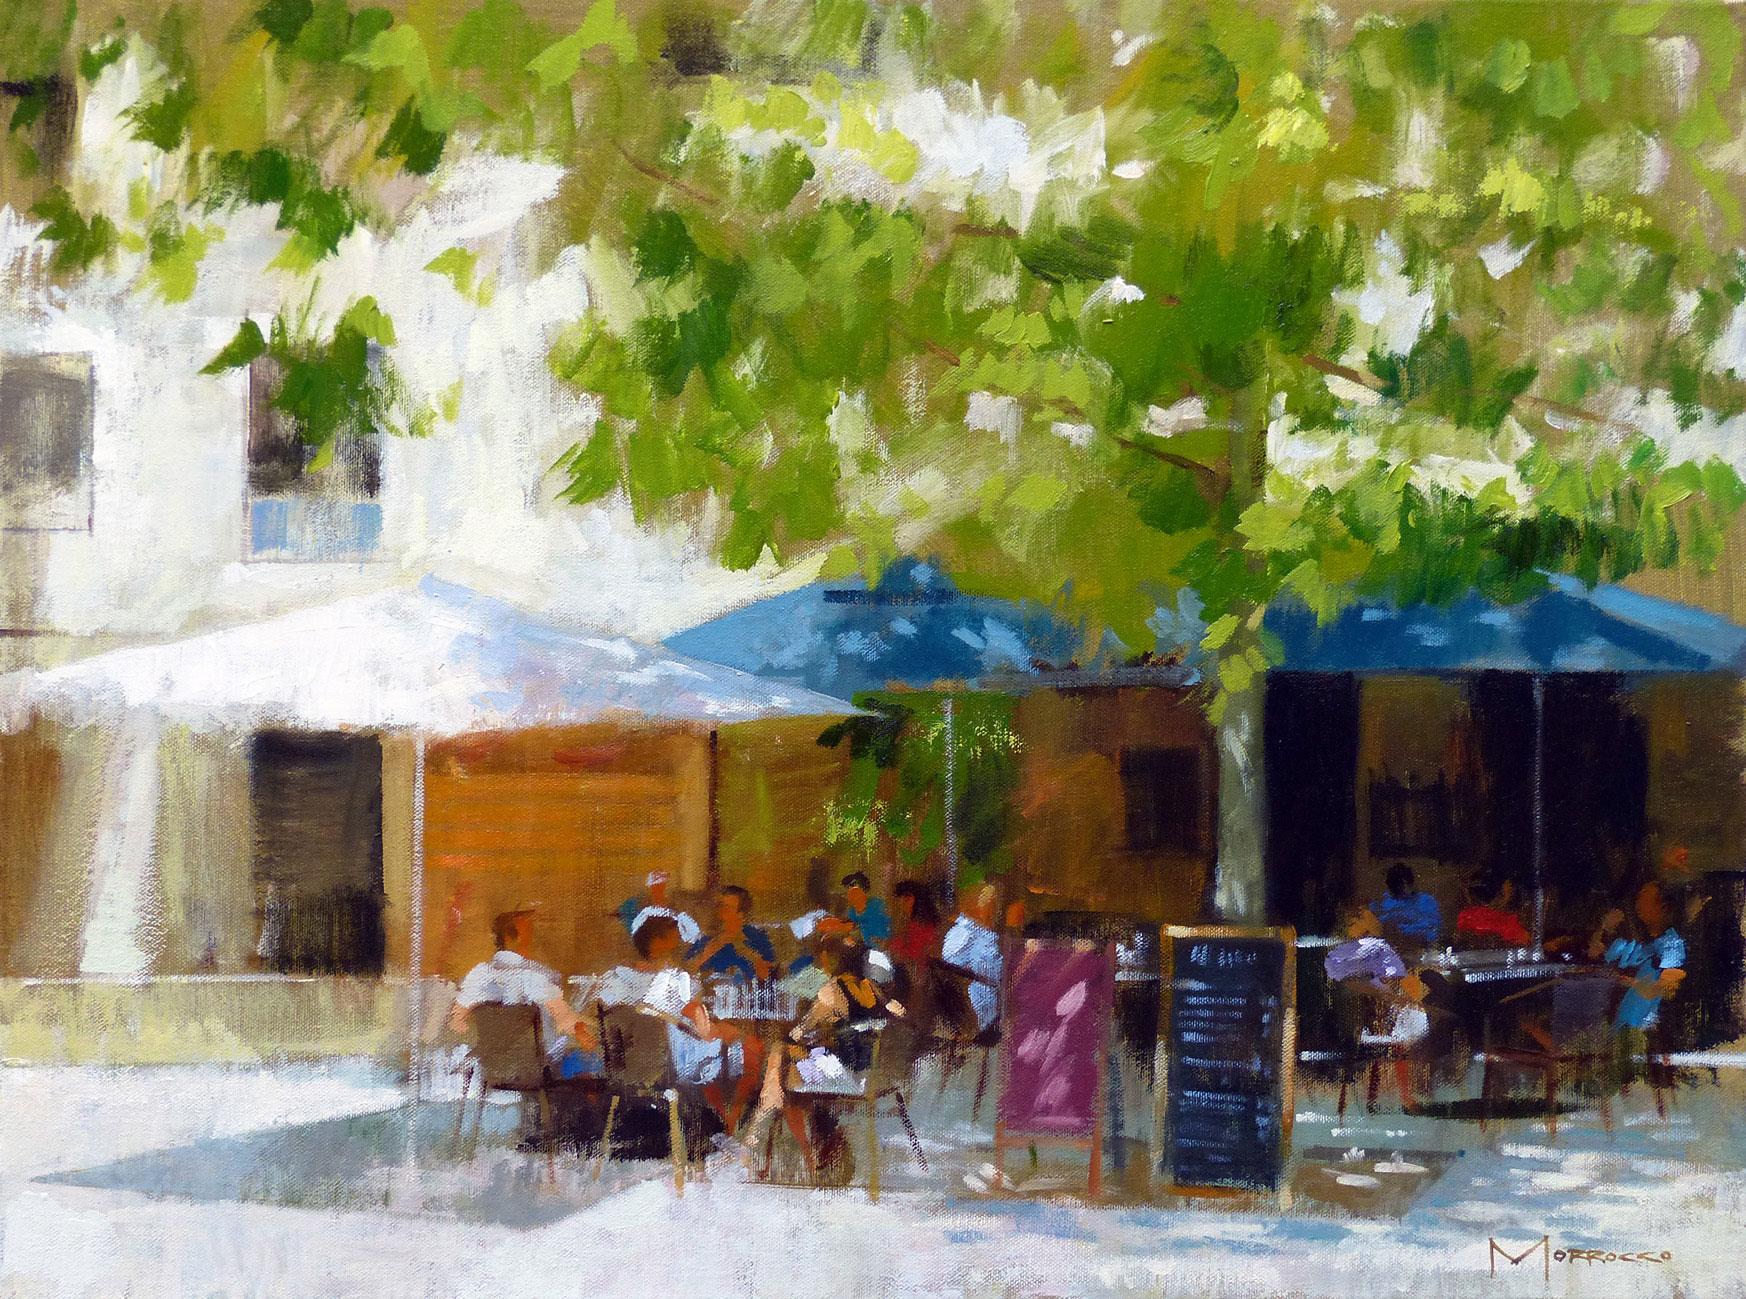 Jack  Morrocco Dejeuner, Courmarin, Provence